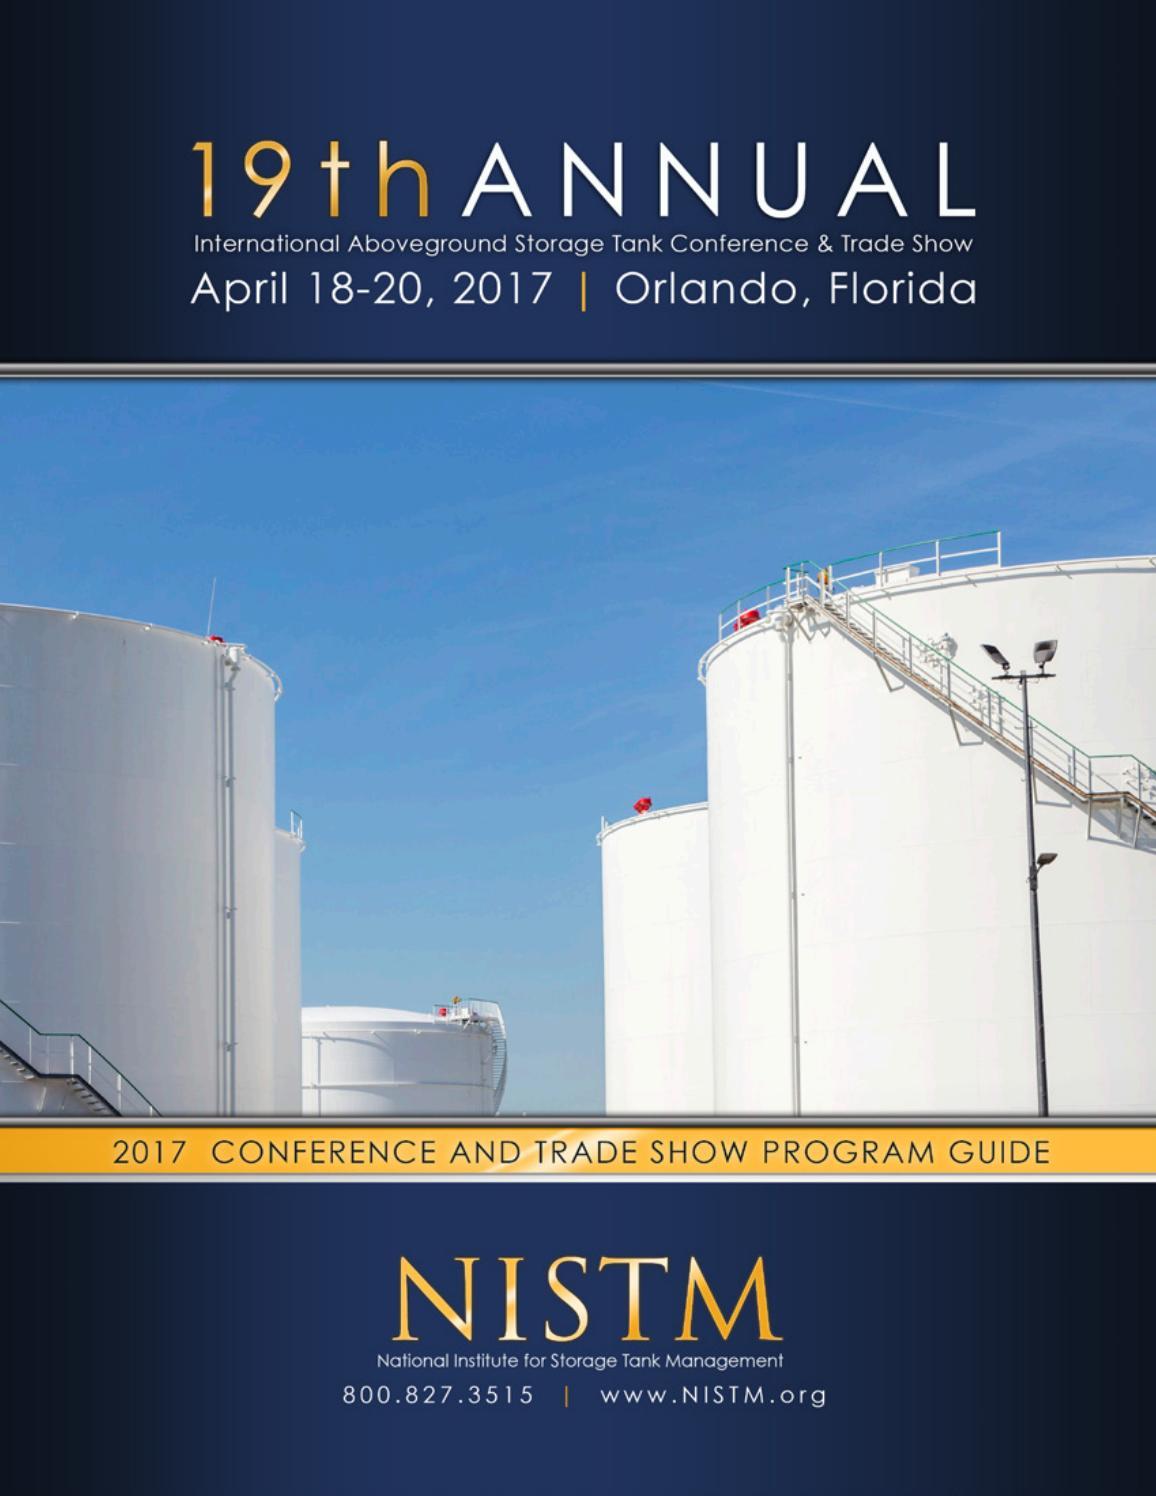 NISTM Program Guide - 19th Annual International Aboveground